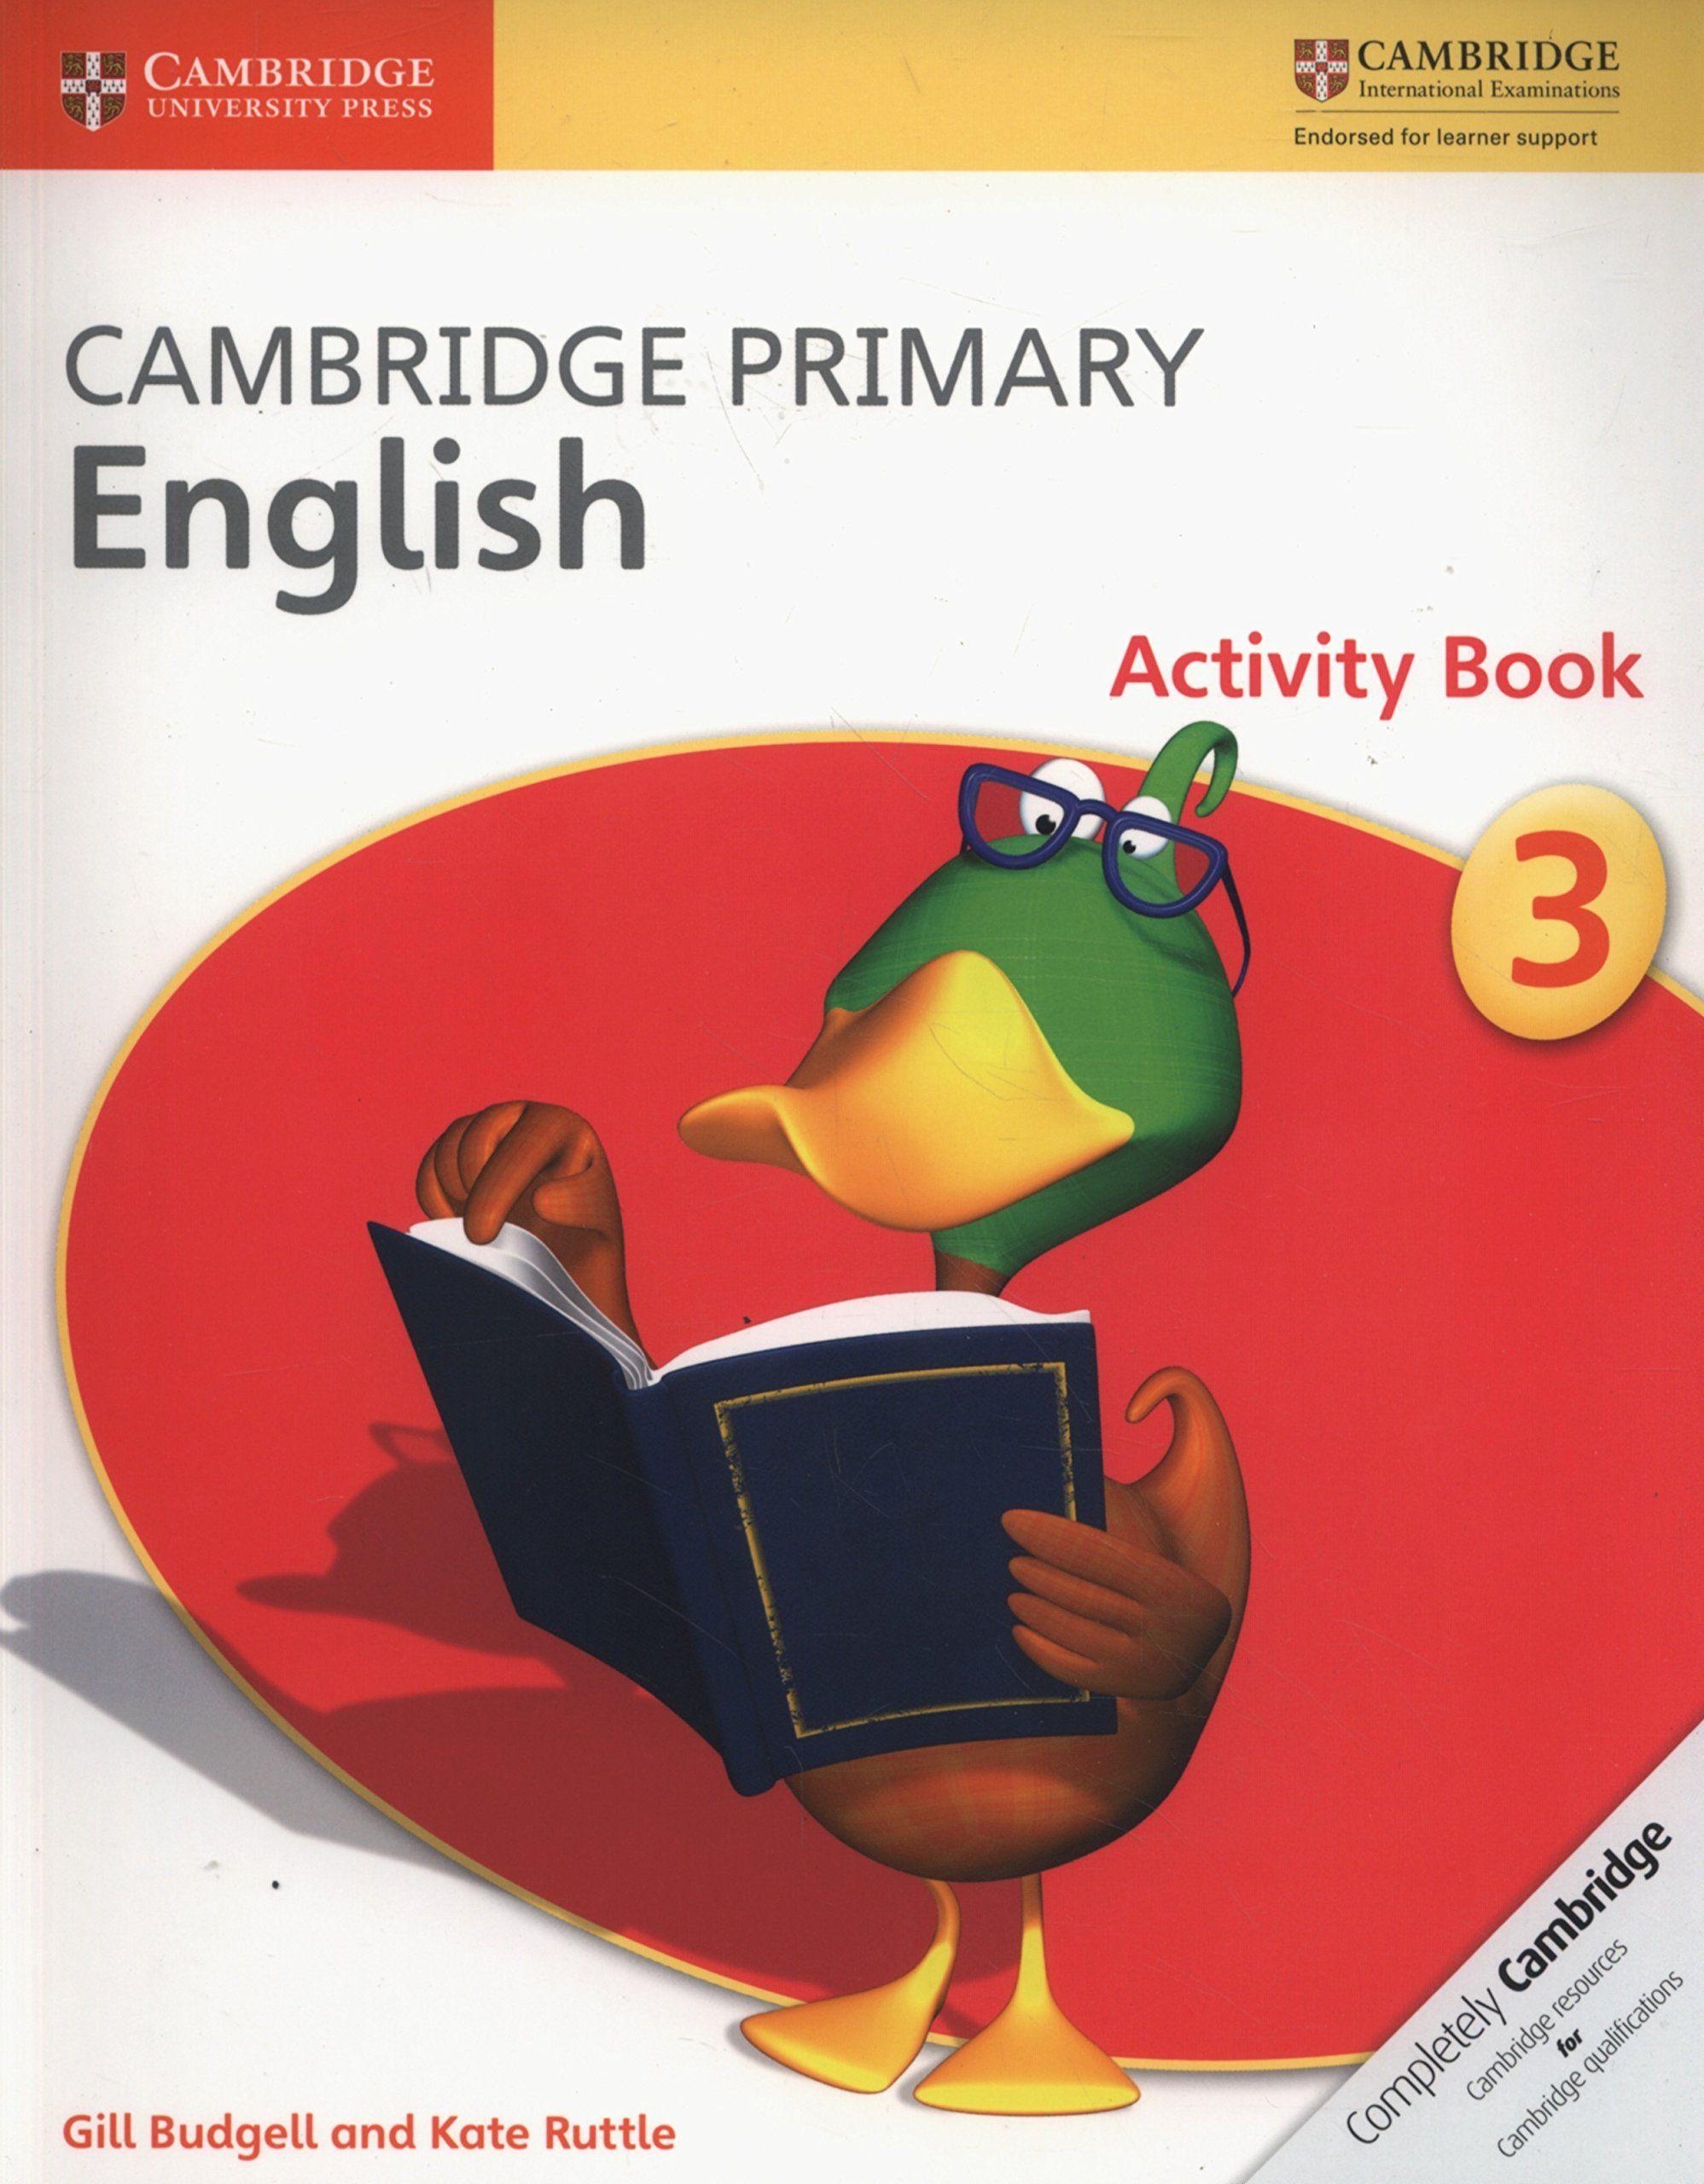 Picture of Cambridge Primary English: Cambridge Primary English Activity Book Stage 3 Activity Book